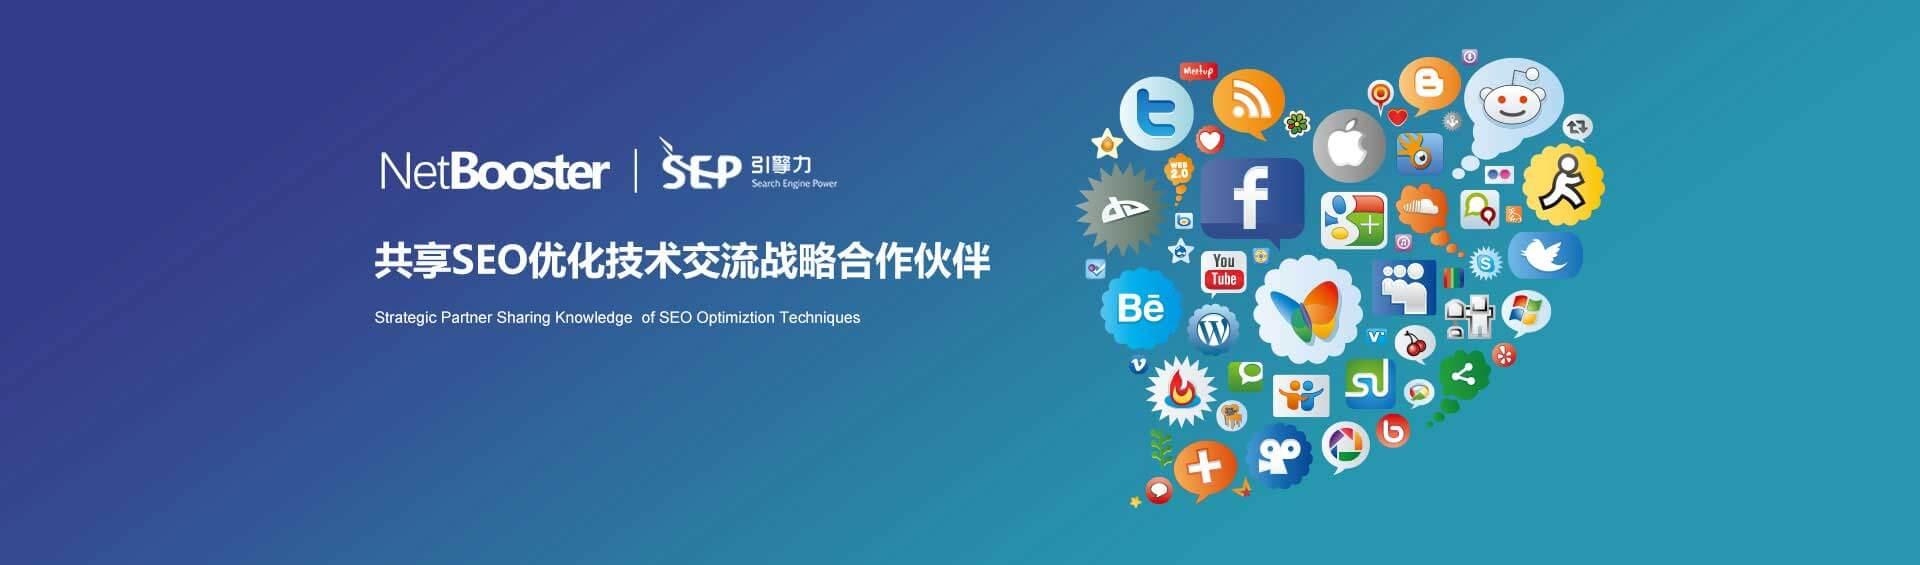 SEO优化技术交流战略合作伙伴